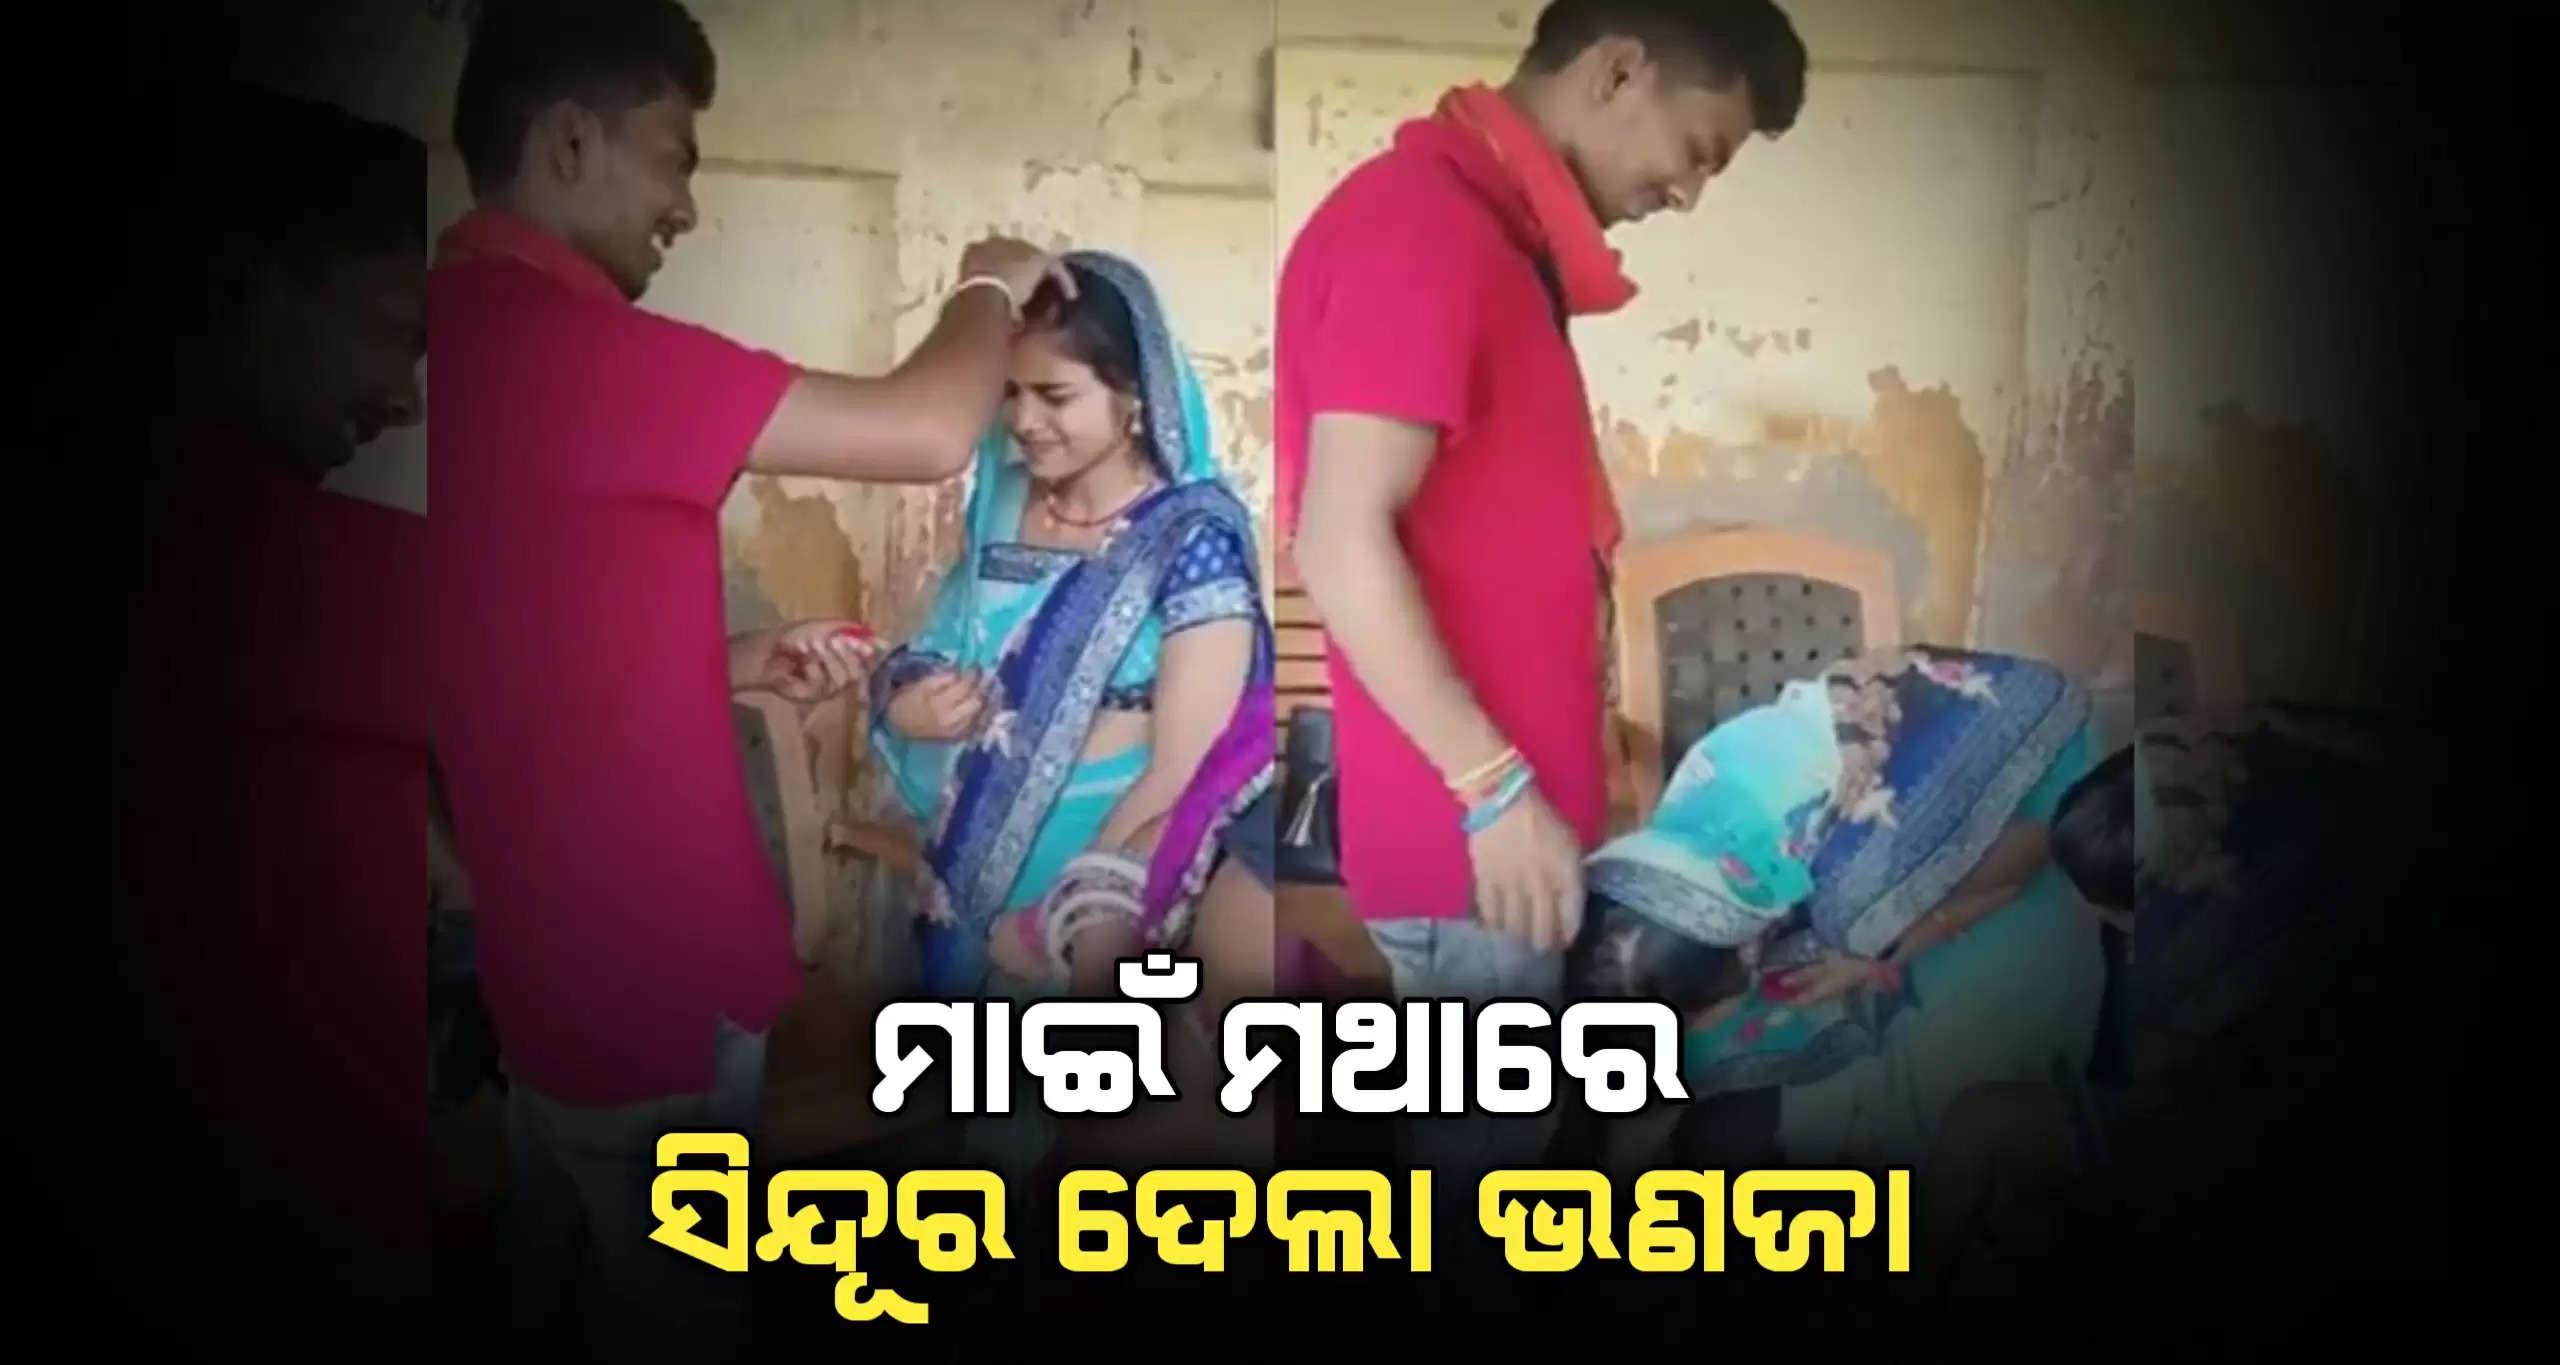 Main bhanaja